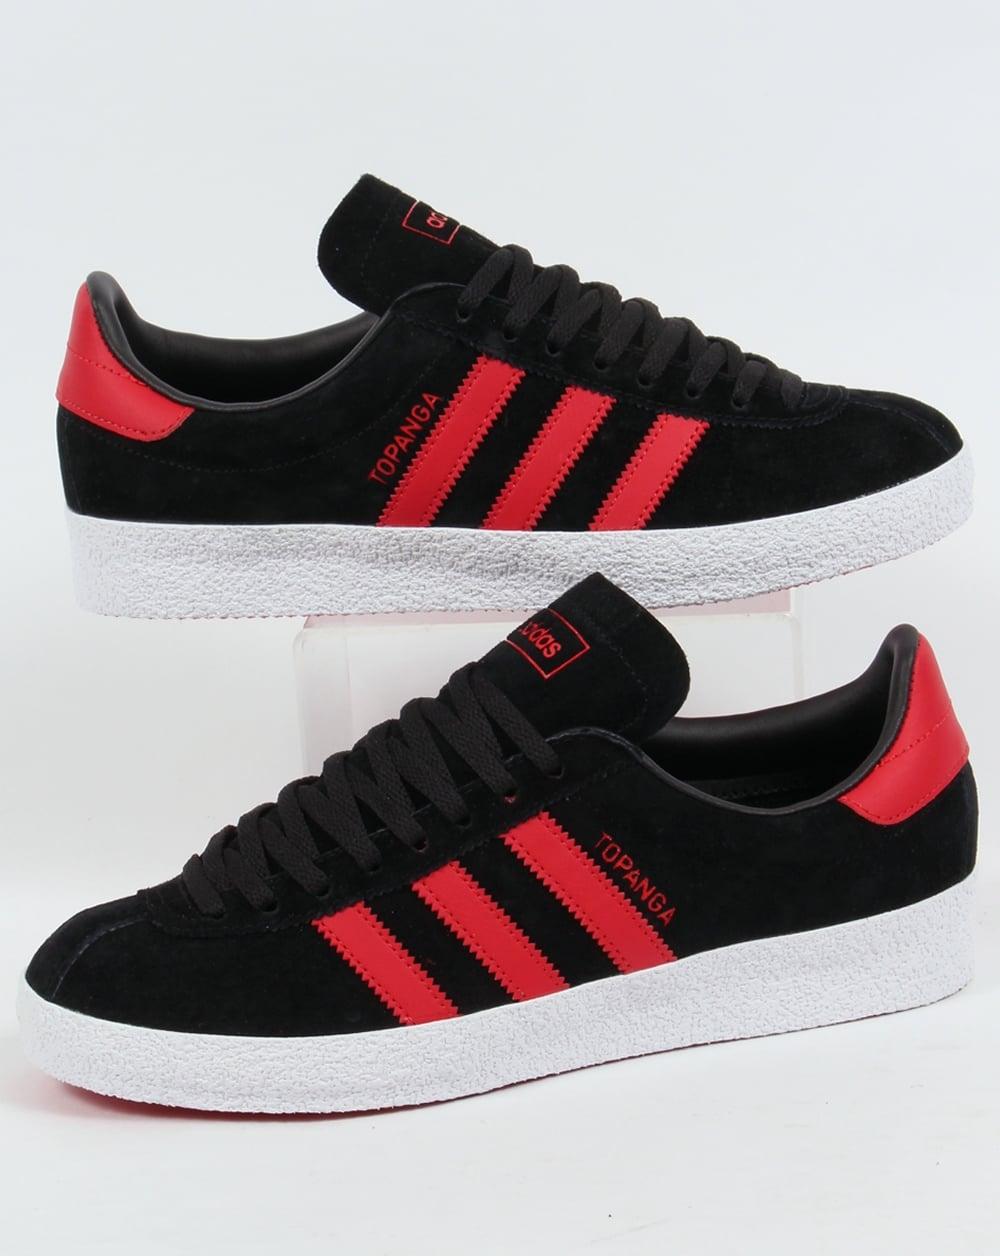 Adidas Topanga Trainers Black/Red